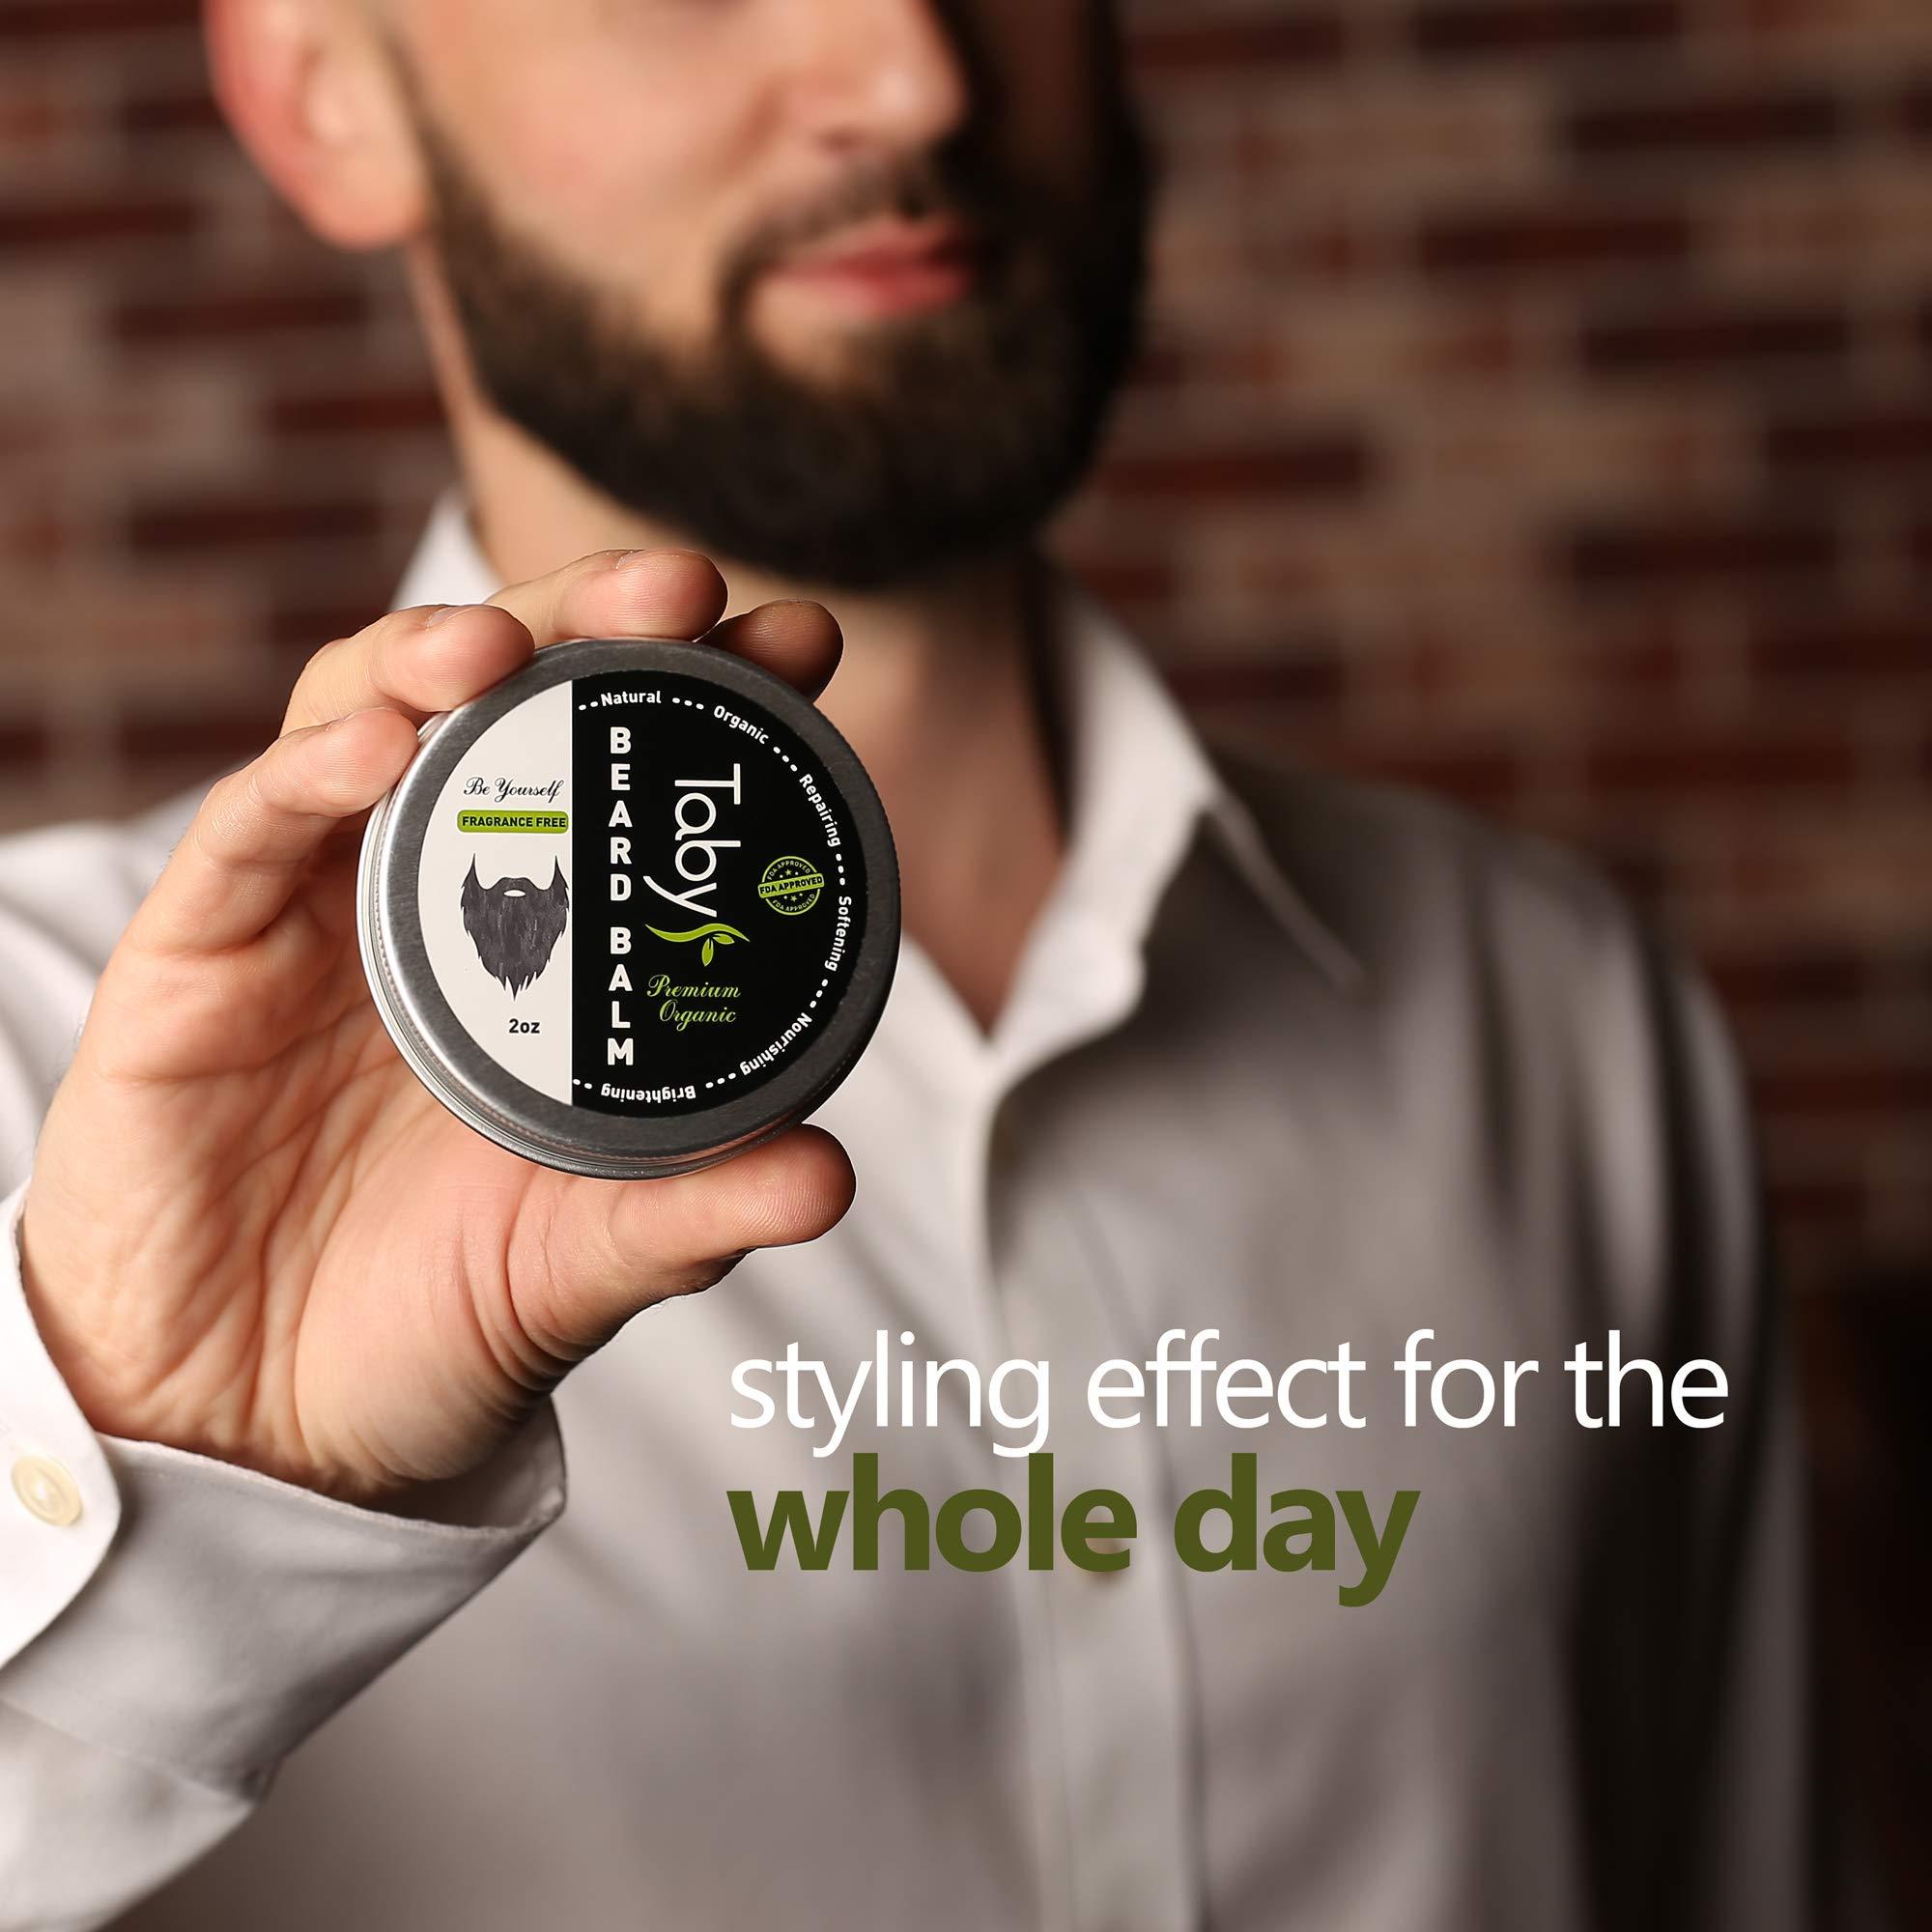 Beard Balm with Argan & Jojoba Oils - Eucalyptus Scent Conditioner Strengthens & Softens Beards & Mustaches